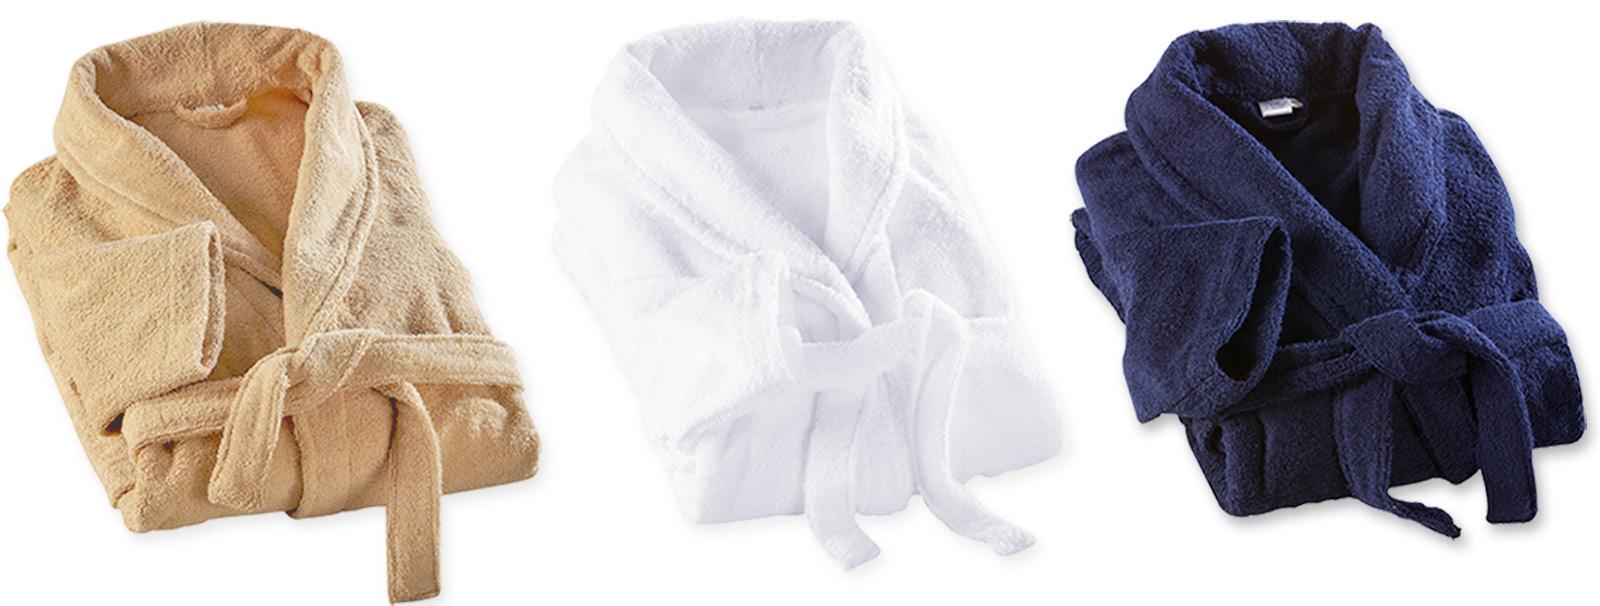 VIP badekåper